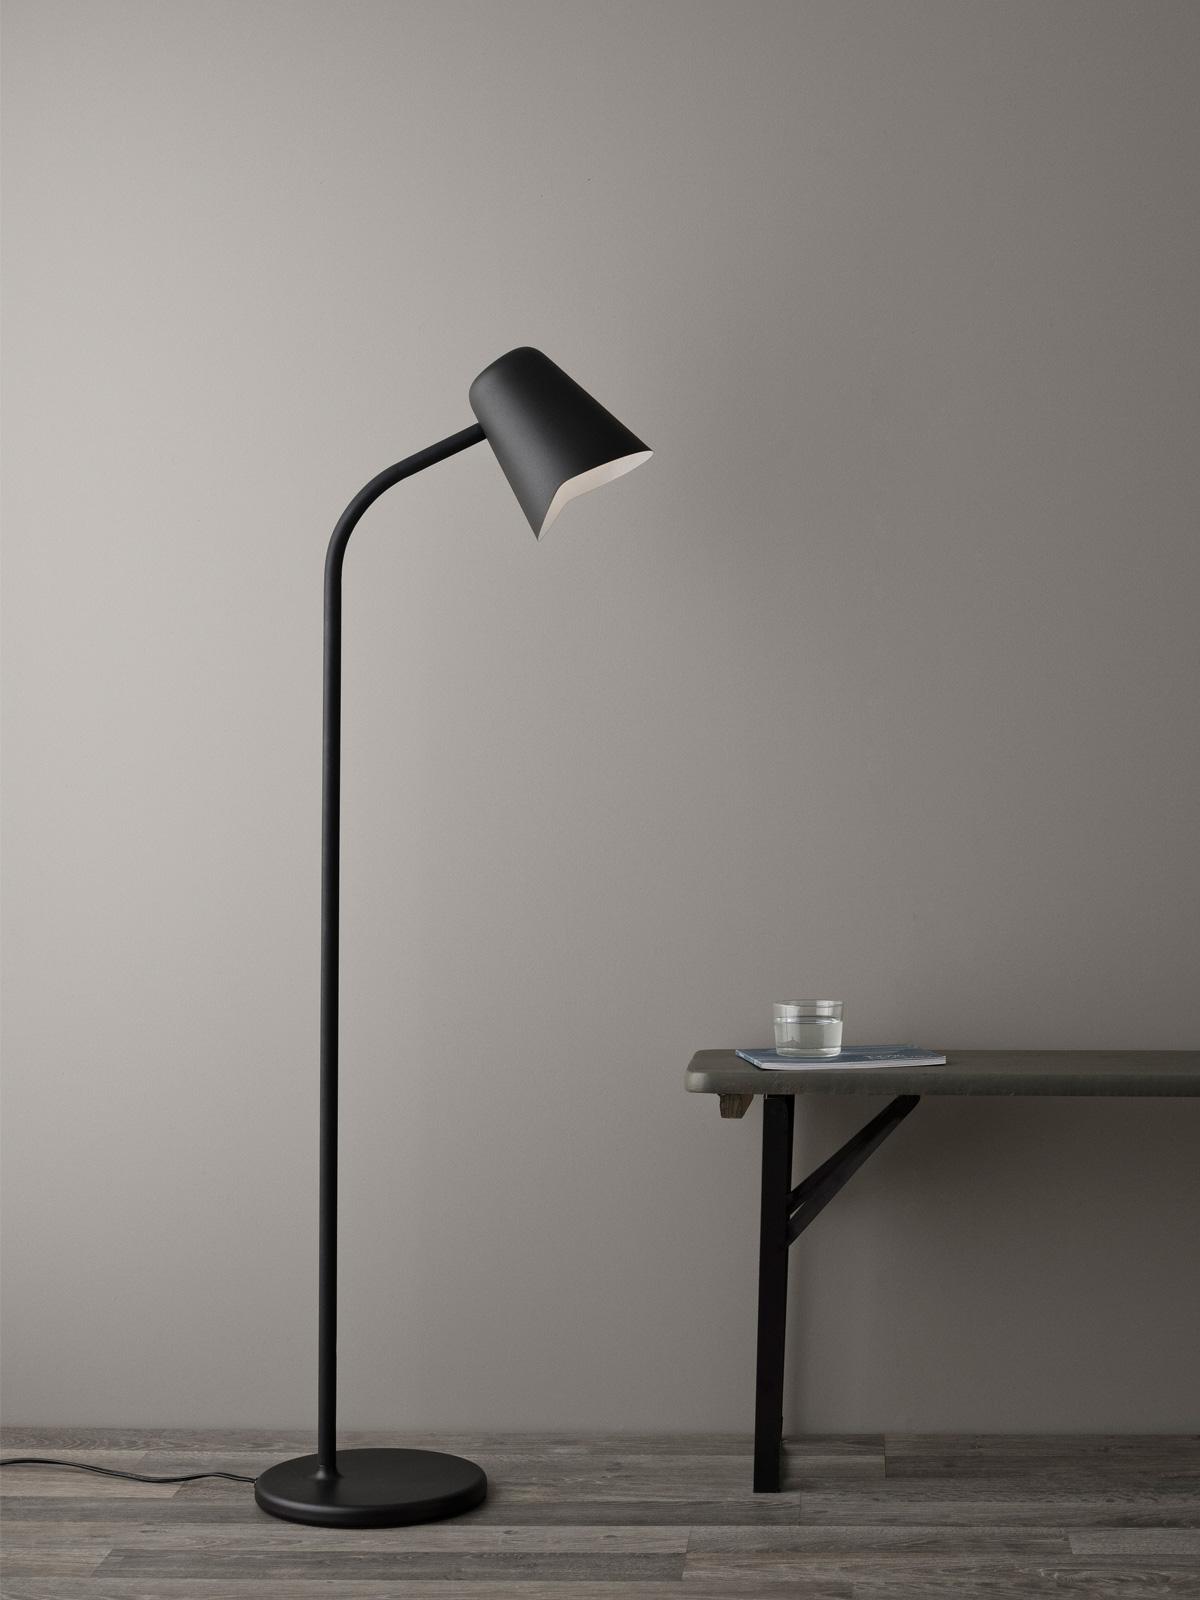 DesignOrt Blog: Best of Designduos Silikon und Stahl Leseleuchte Me Northern Lighting